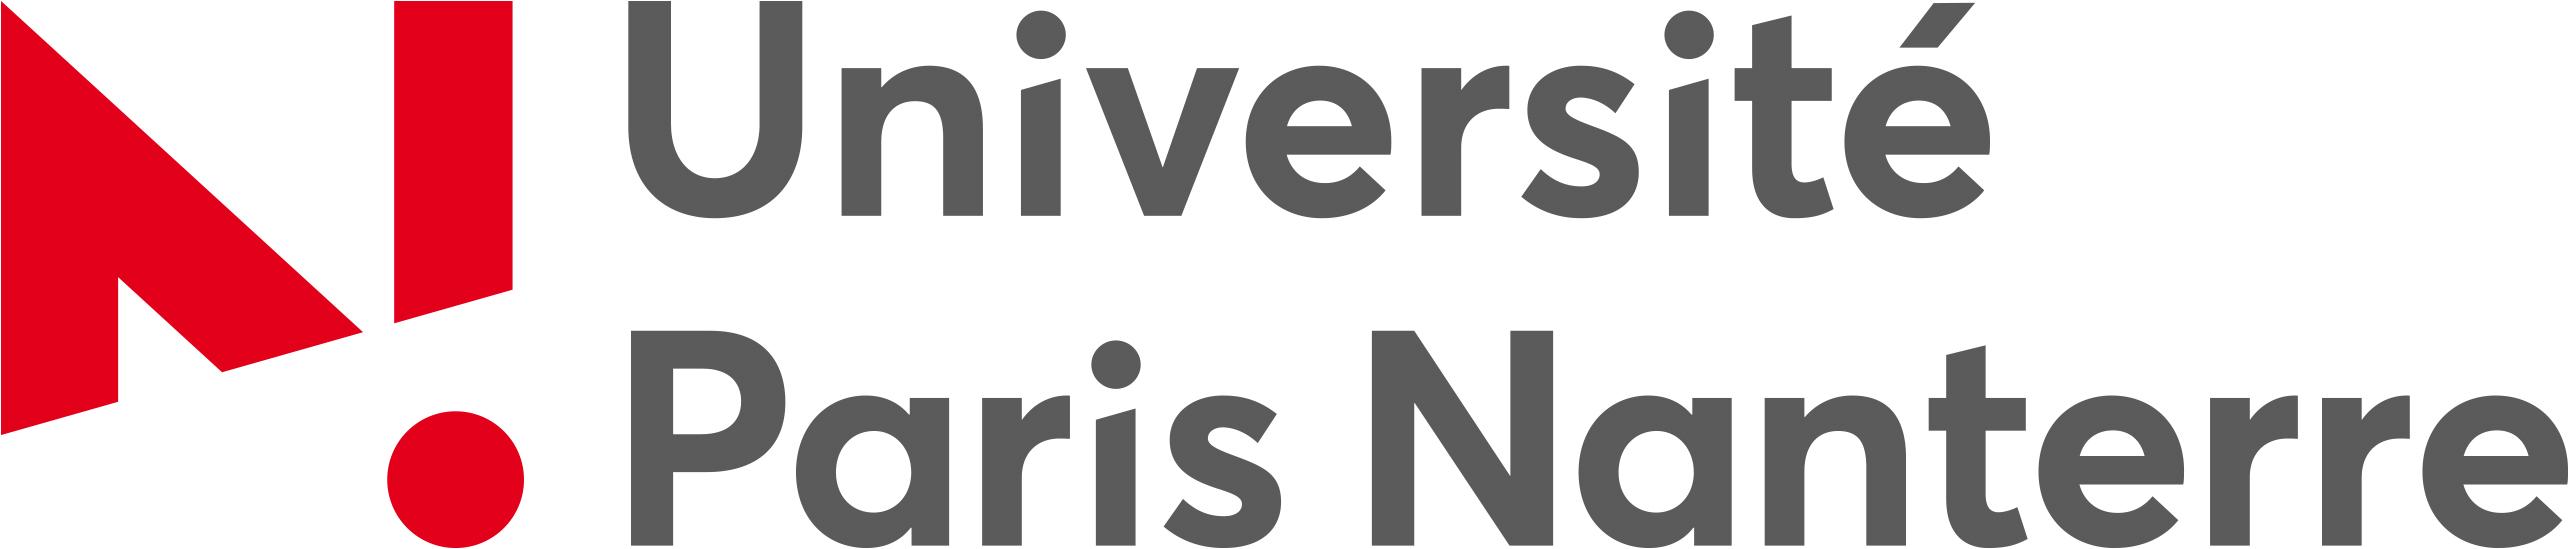 logo_Paris_Nanterre_couleur_CMJN_1.jpg